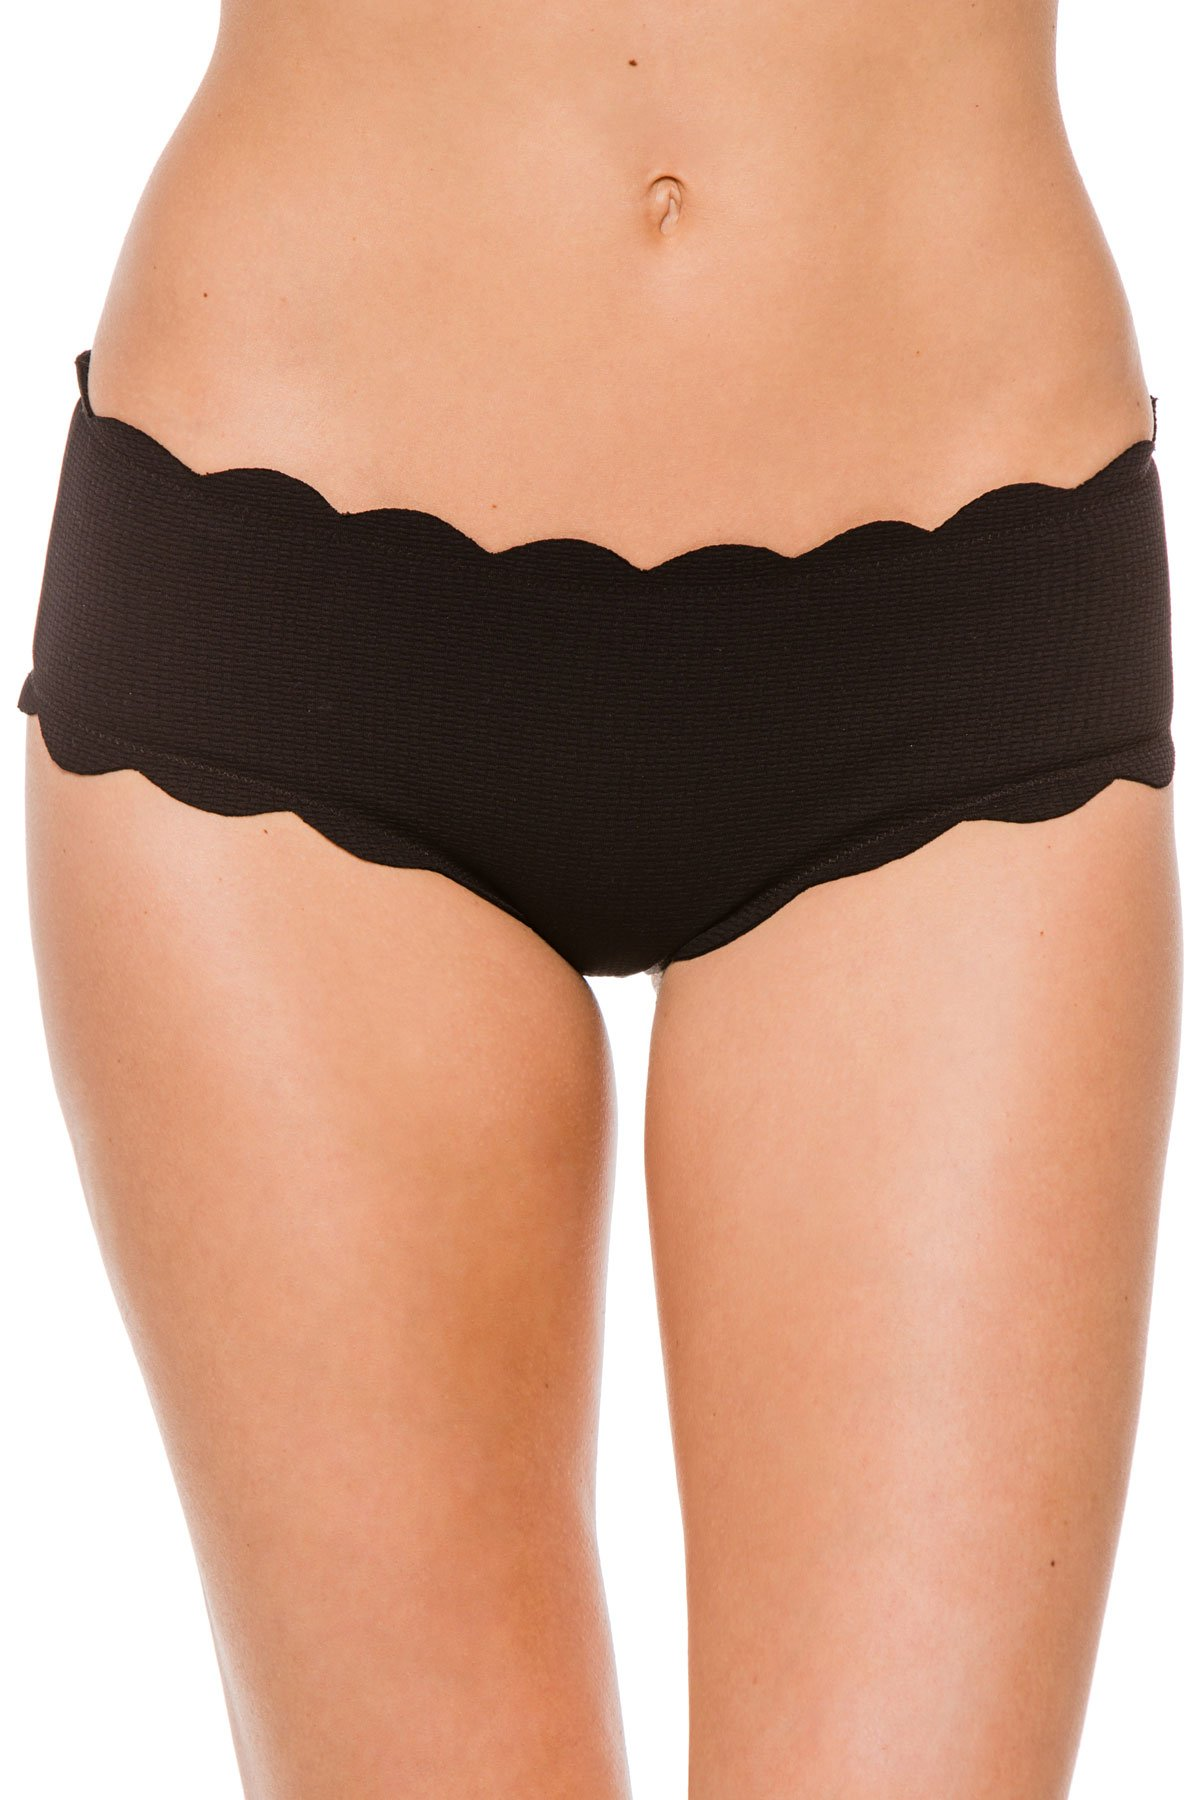 Marysia Women's Antibes Scallop Spring Boyshort Bikini Bottom Black M by Marysia